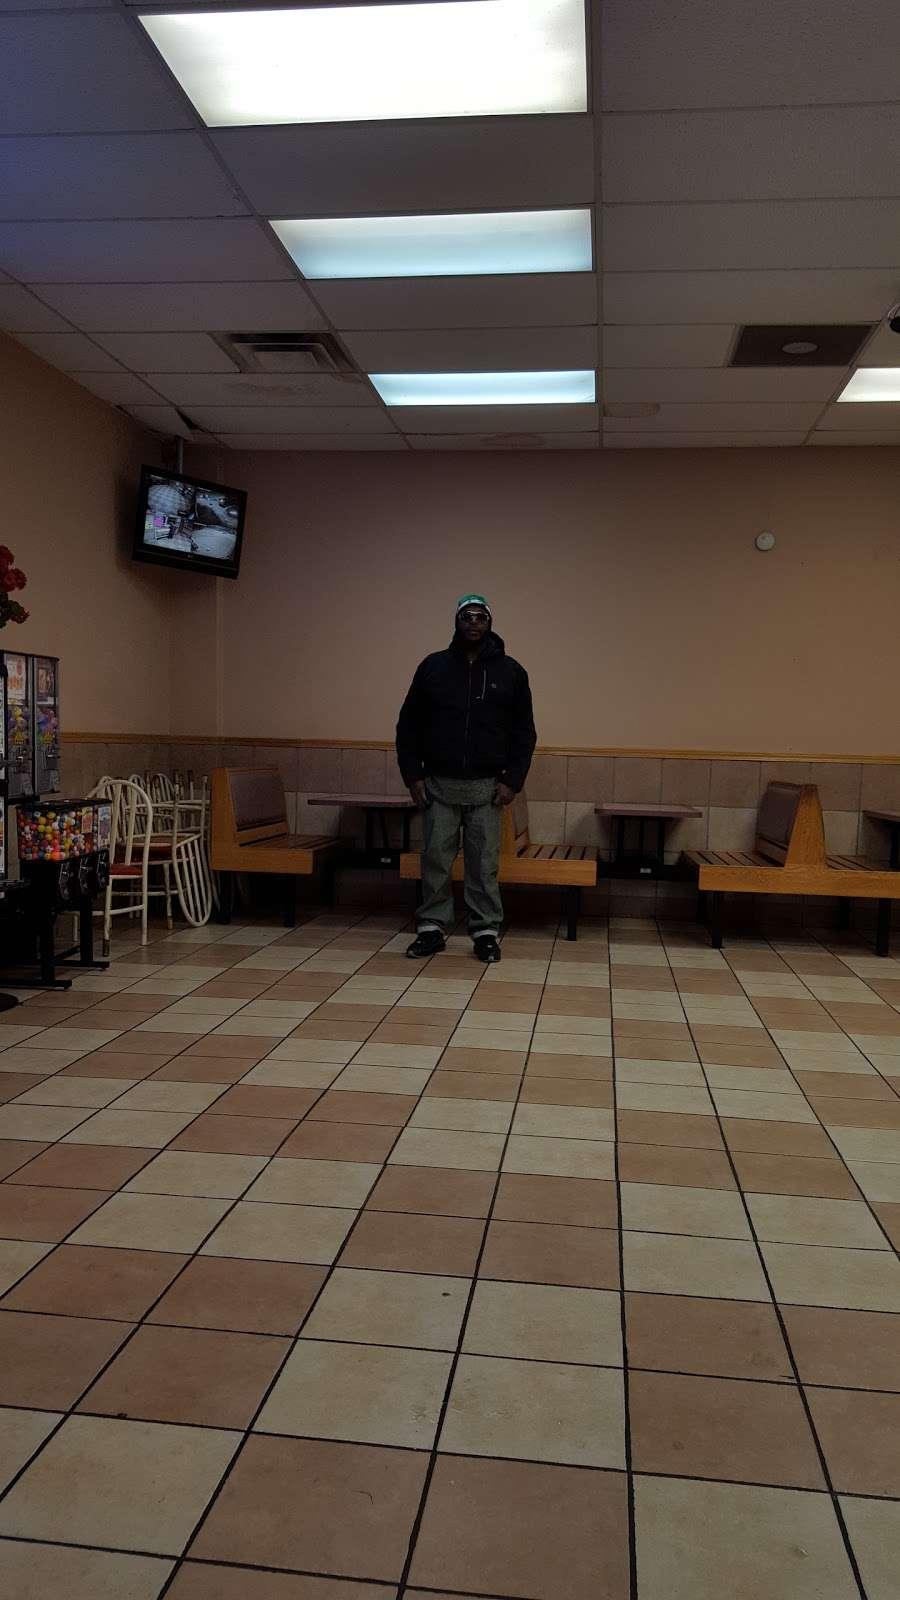 Captain Fresh Fish & Chicken - restaurant    Photo 9 of 10   Address: 1633 E Court St, Kankakee, IL 60901, USA   Phone: (815) 933-8422